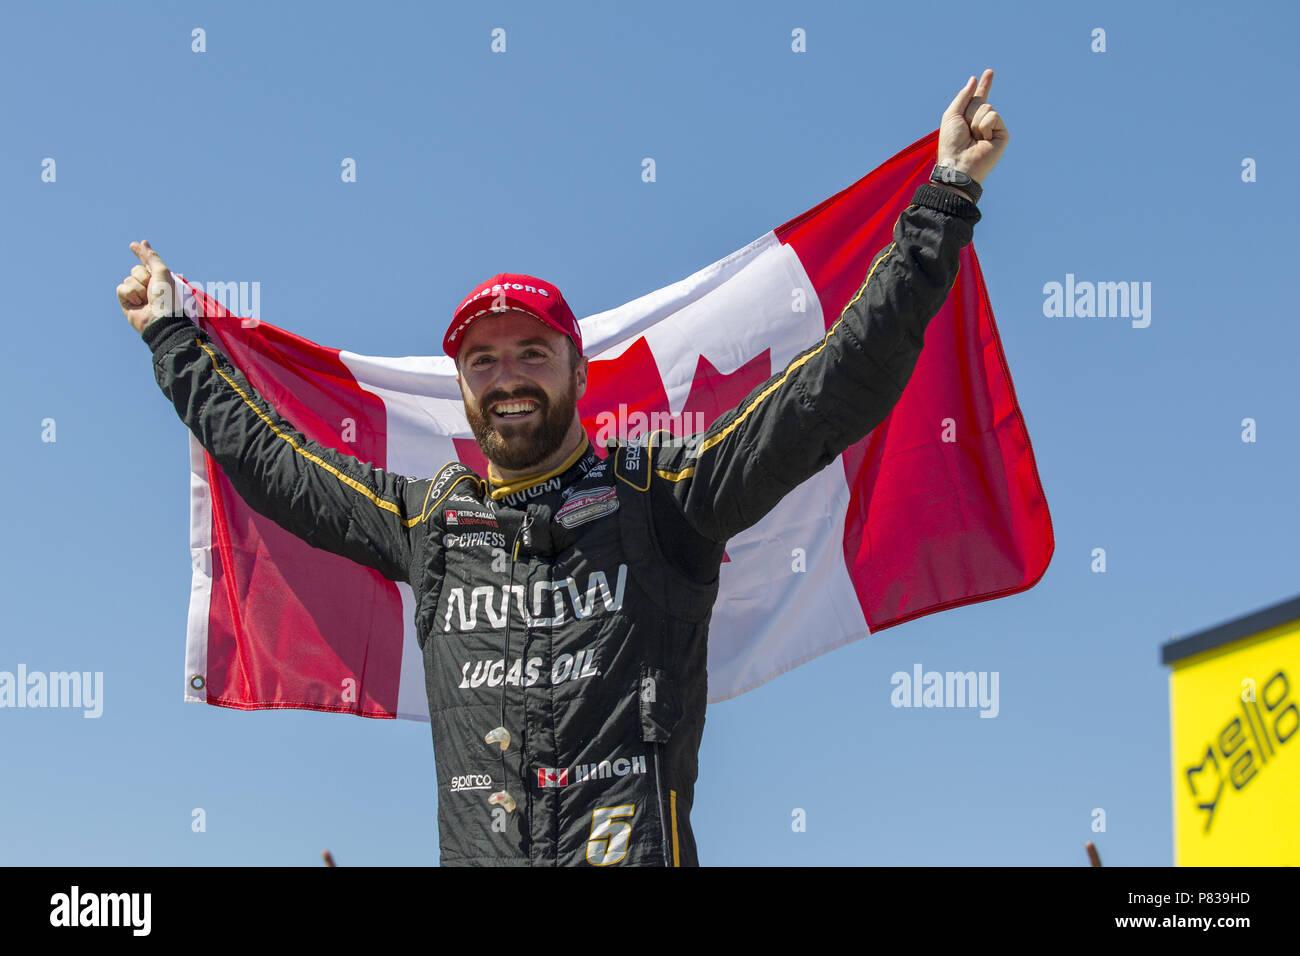 Newton, Iowa, USA. 8th July, 2018. JAMES HINCHCLIFFE (5) of Canada wins the Iowa Corn 300 at Iowa Speedway in Newton, Iowa. Credit: Justin R. Noe Asp Inc/ASP/ZUMA Wire/Alamy Live News - Stock Image